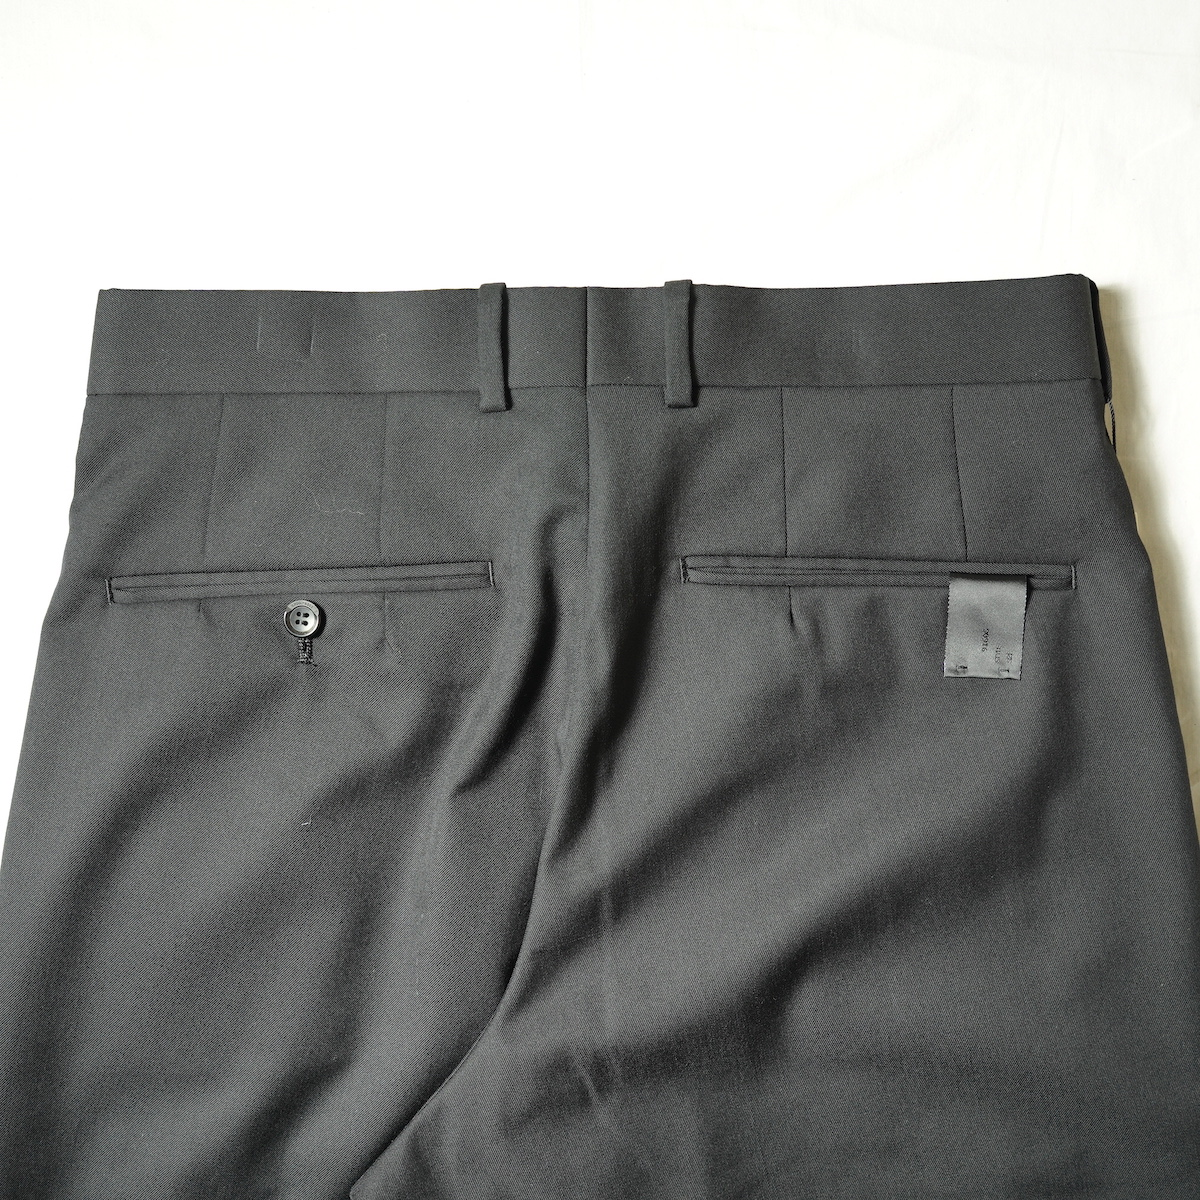 N.HOOLYWOOD / 2212-PT25-022 1TUCK SLACKS (Black)ヒップポケット